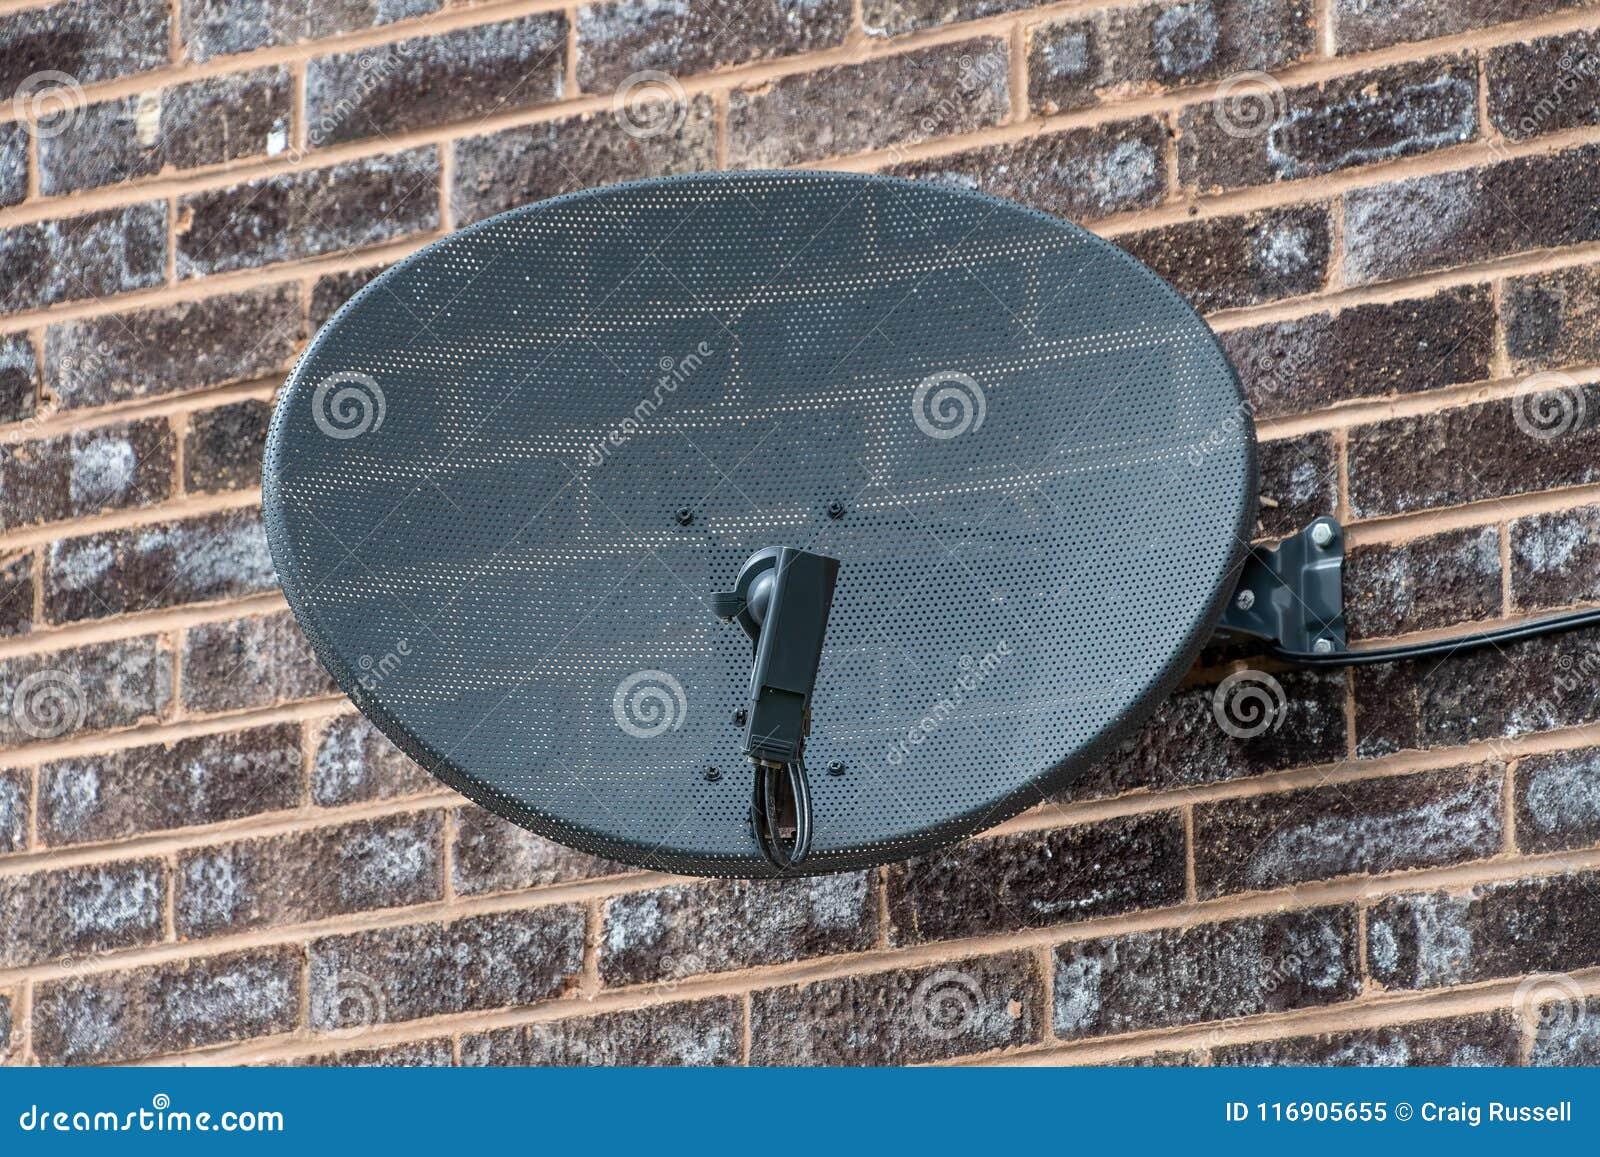 TV satellite dish on a brick wall